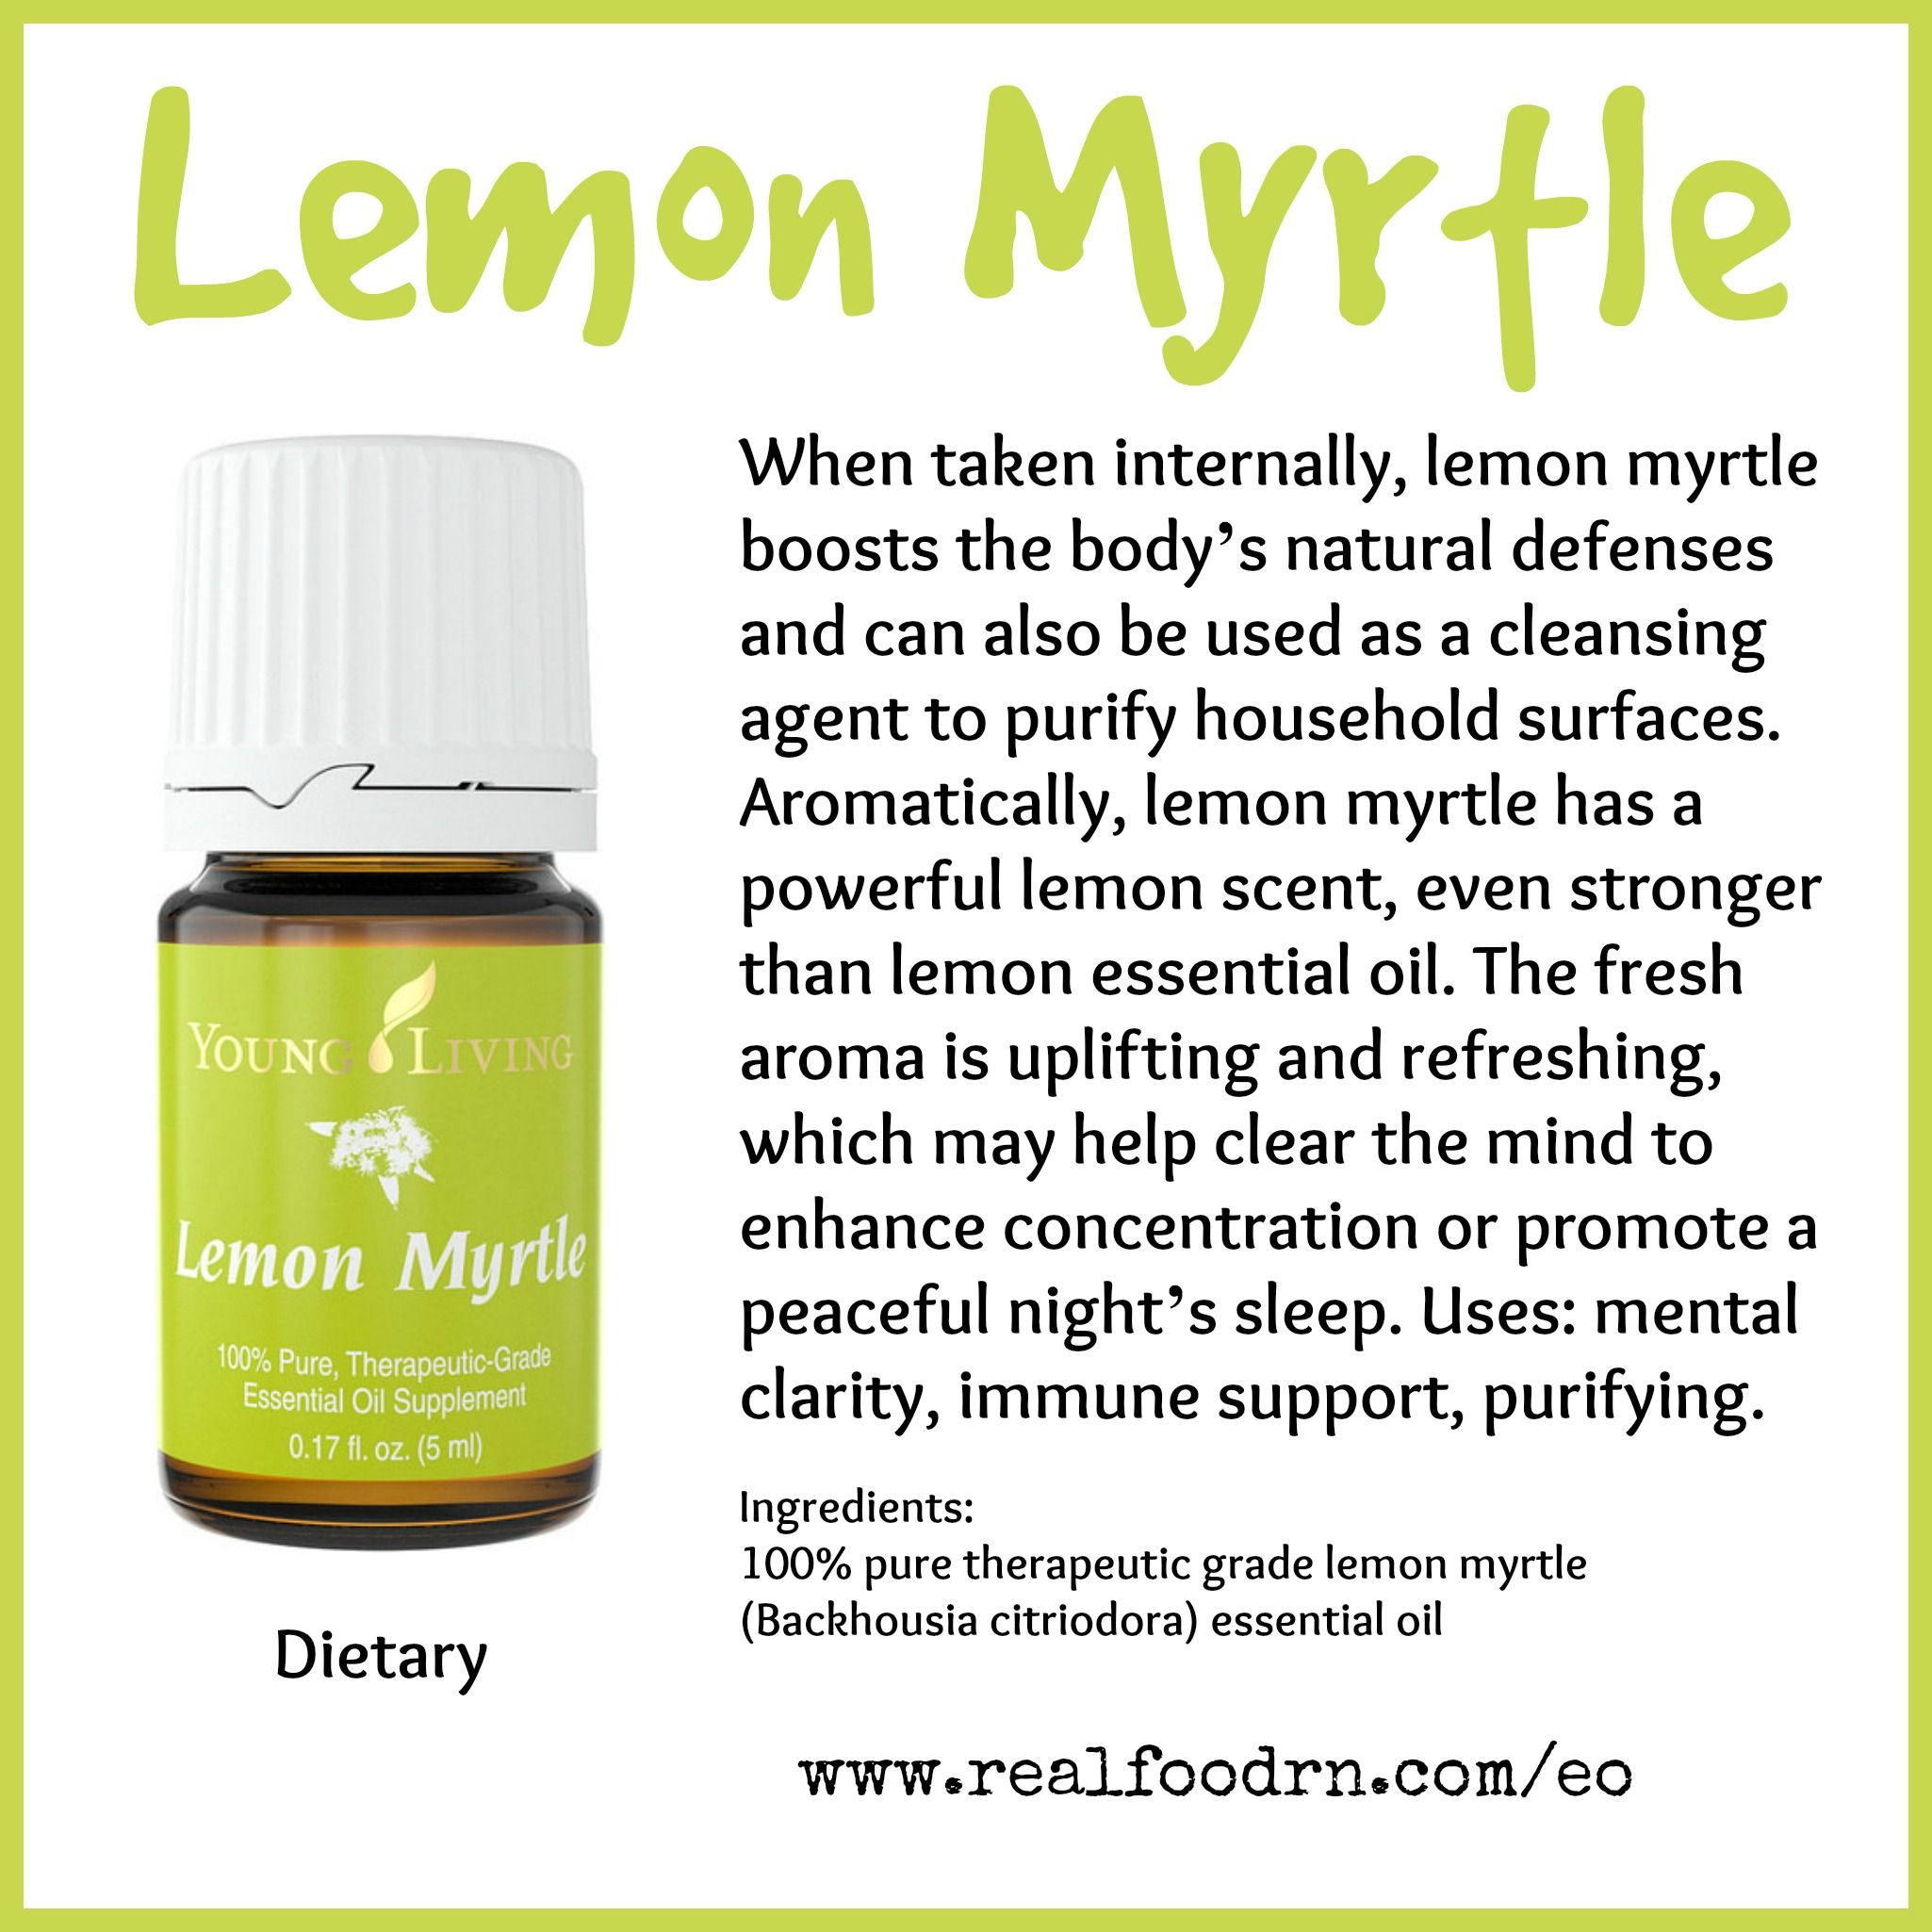 lemon myrtle essential oil oils myrtle essential oil, lemonlemon myrtle essential oil enhance concentration or promote a peaceful night\u0027s sleep lemonmyrtle essentialoils